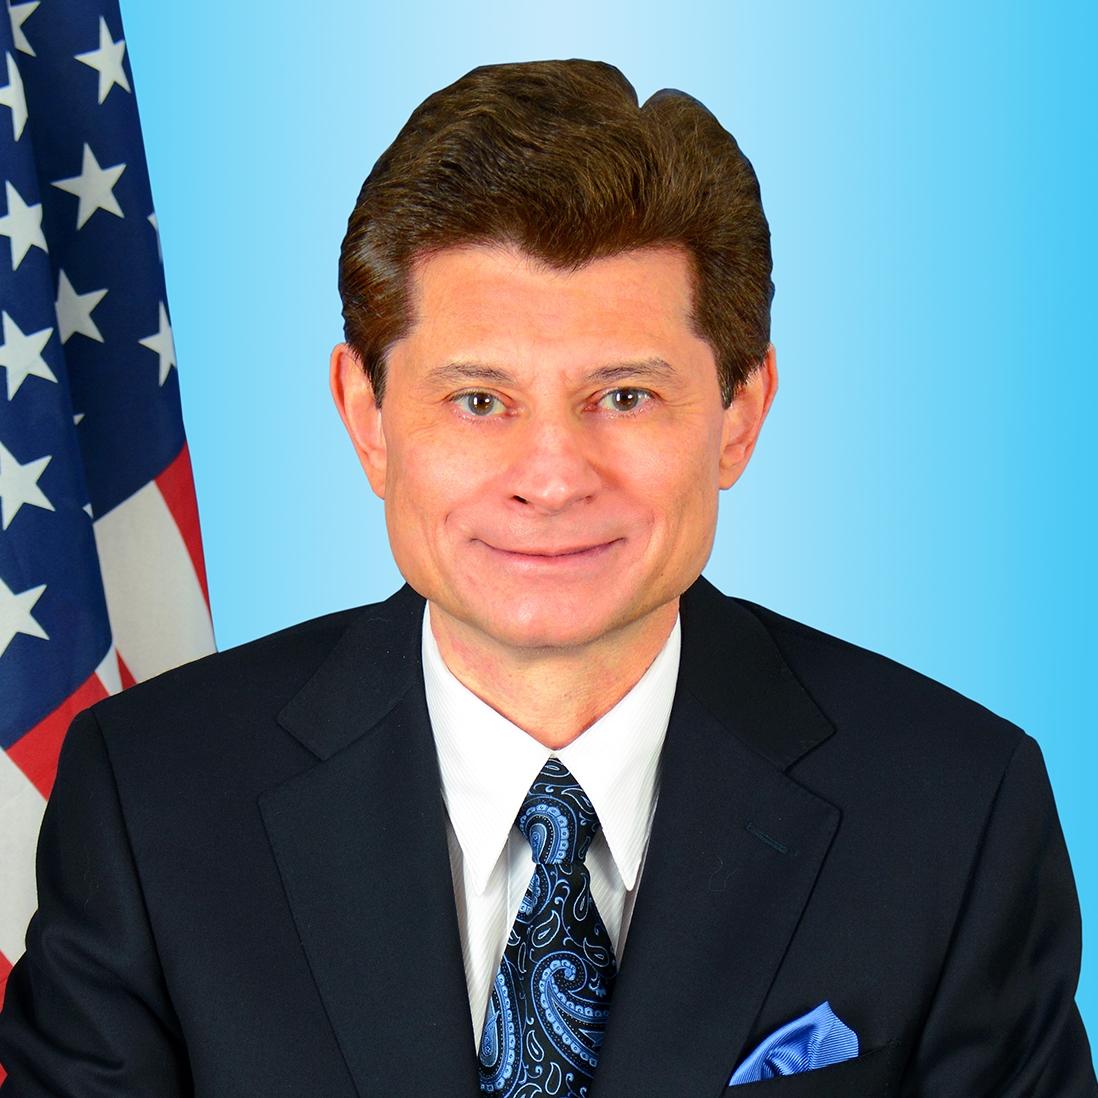 Bill Faloon